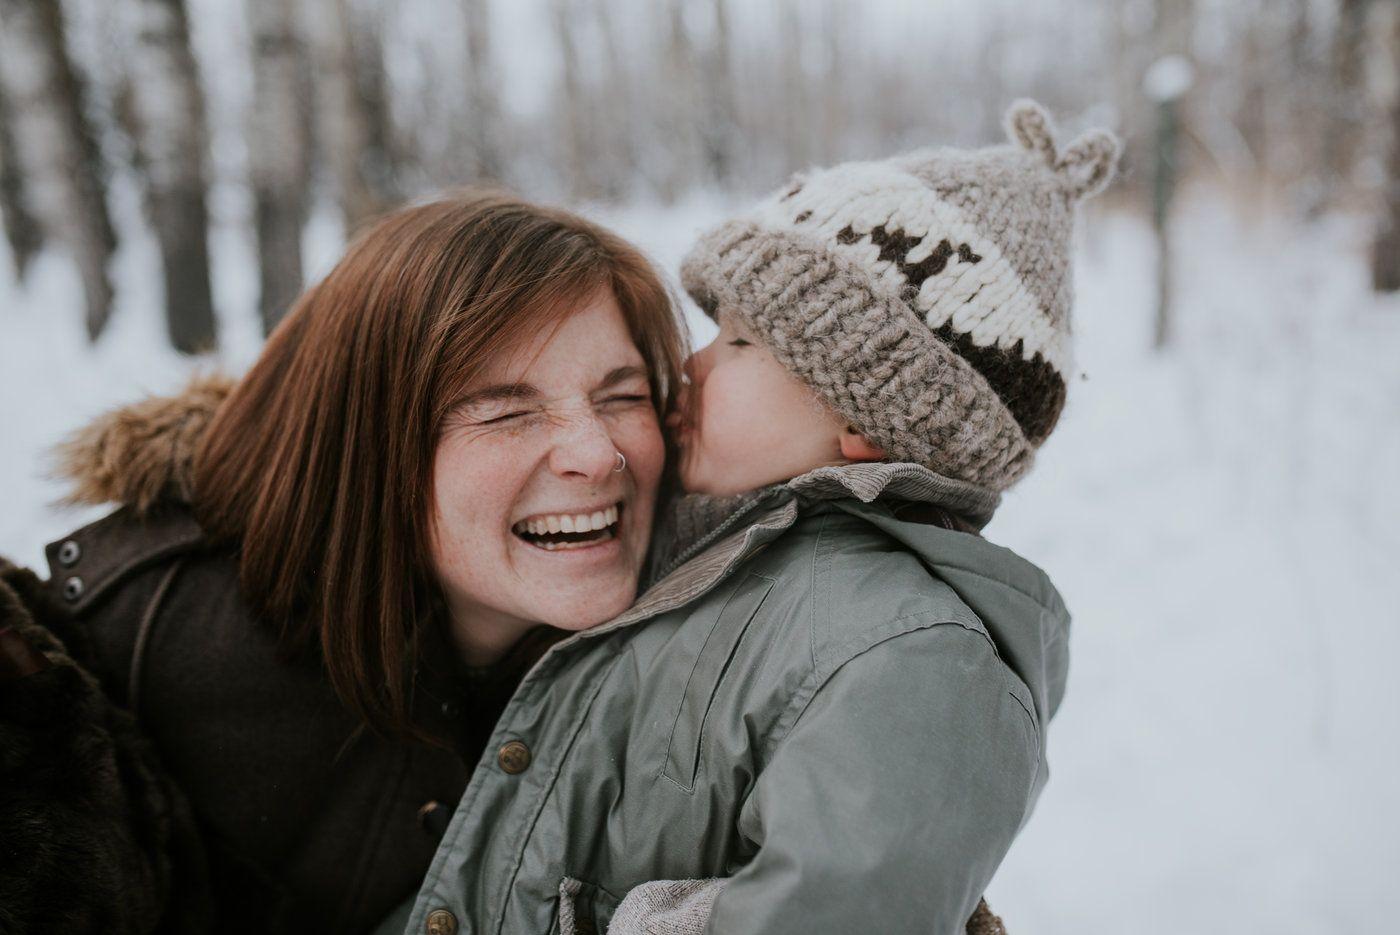 Brianna Sharpe and her son